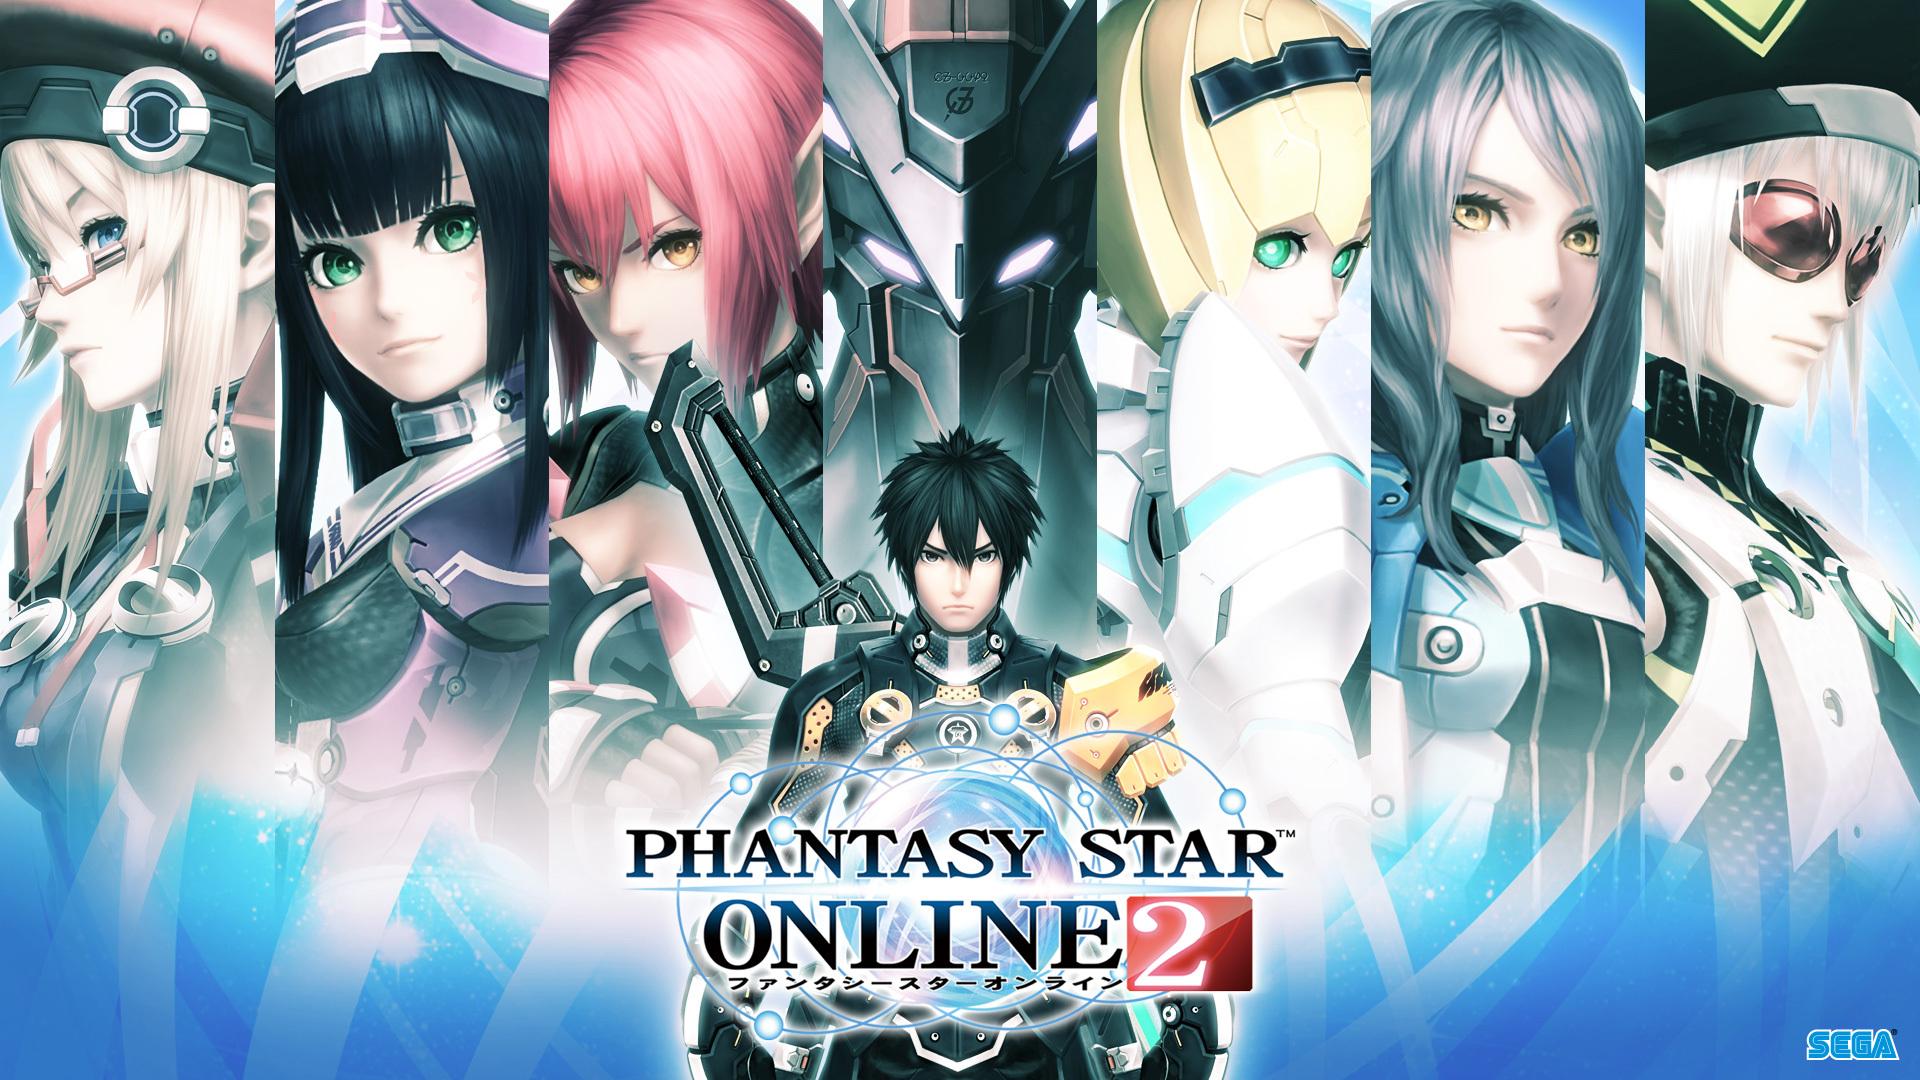 Phantasy Star Online 2 Episode 3 Set To Launch In August